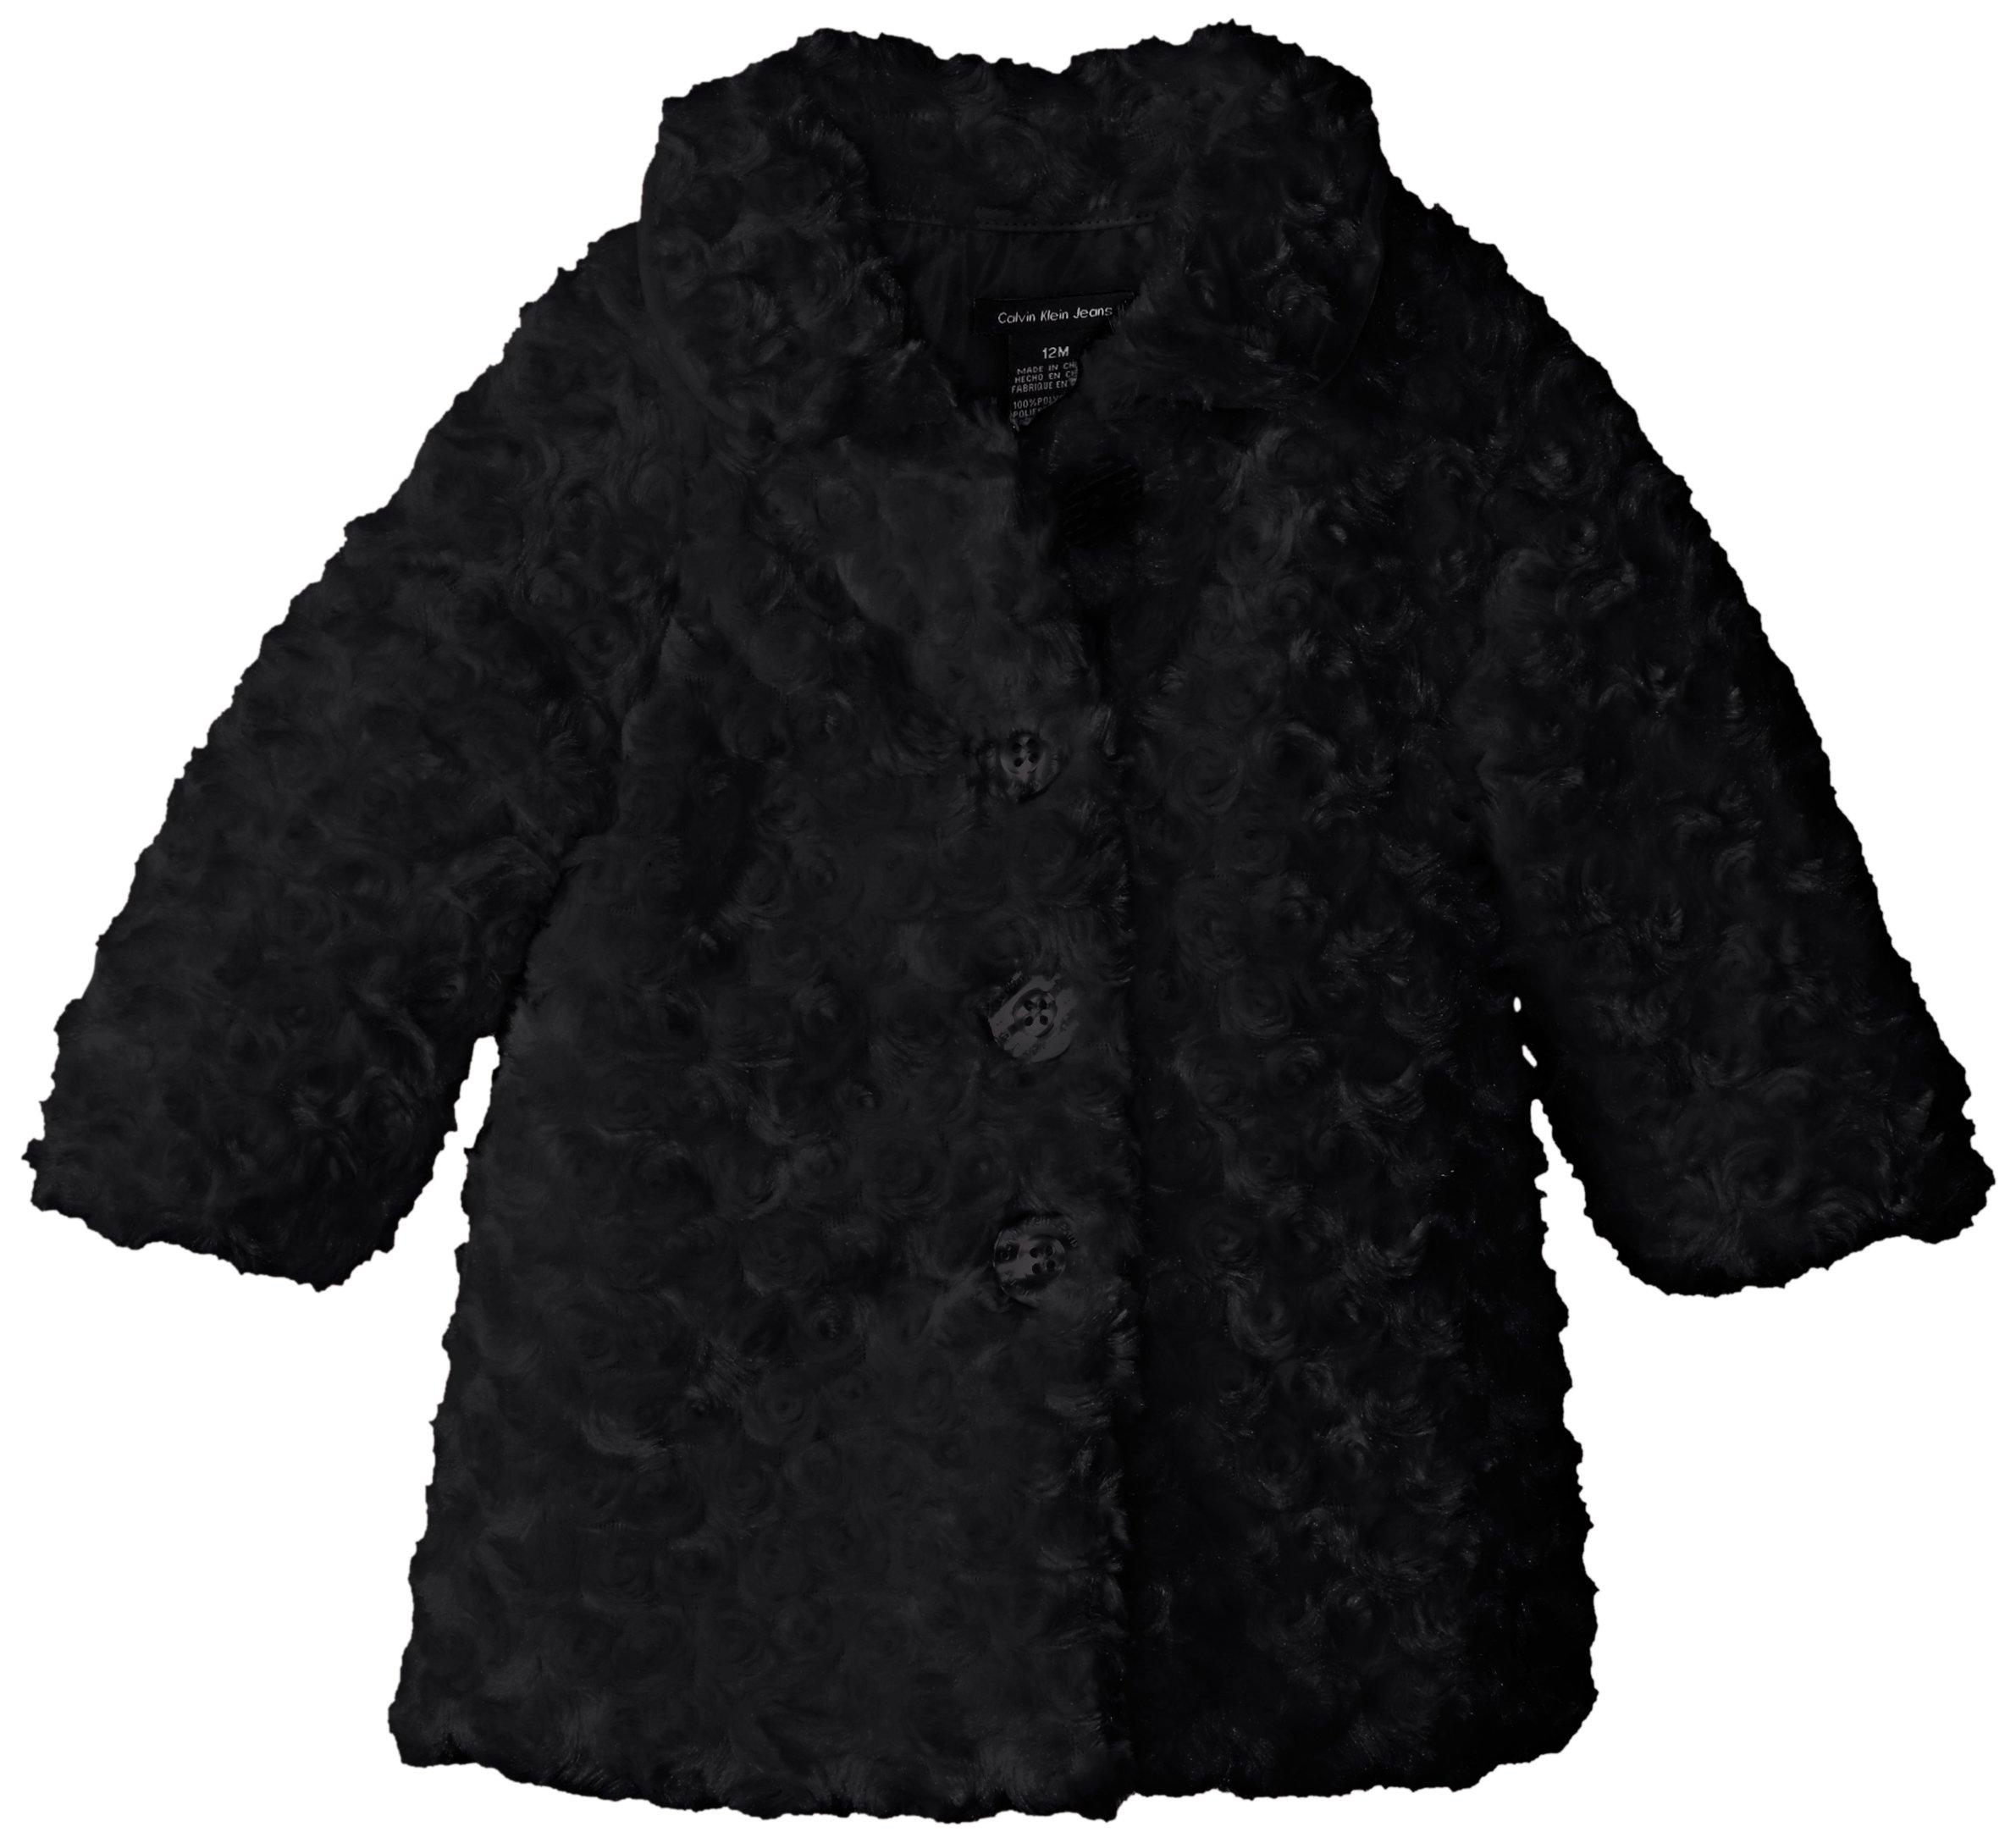 Calvin Klein Baby Girls' Black Faux Fur Jacket, Black, 24 Months